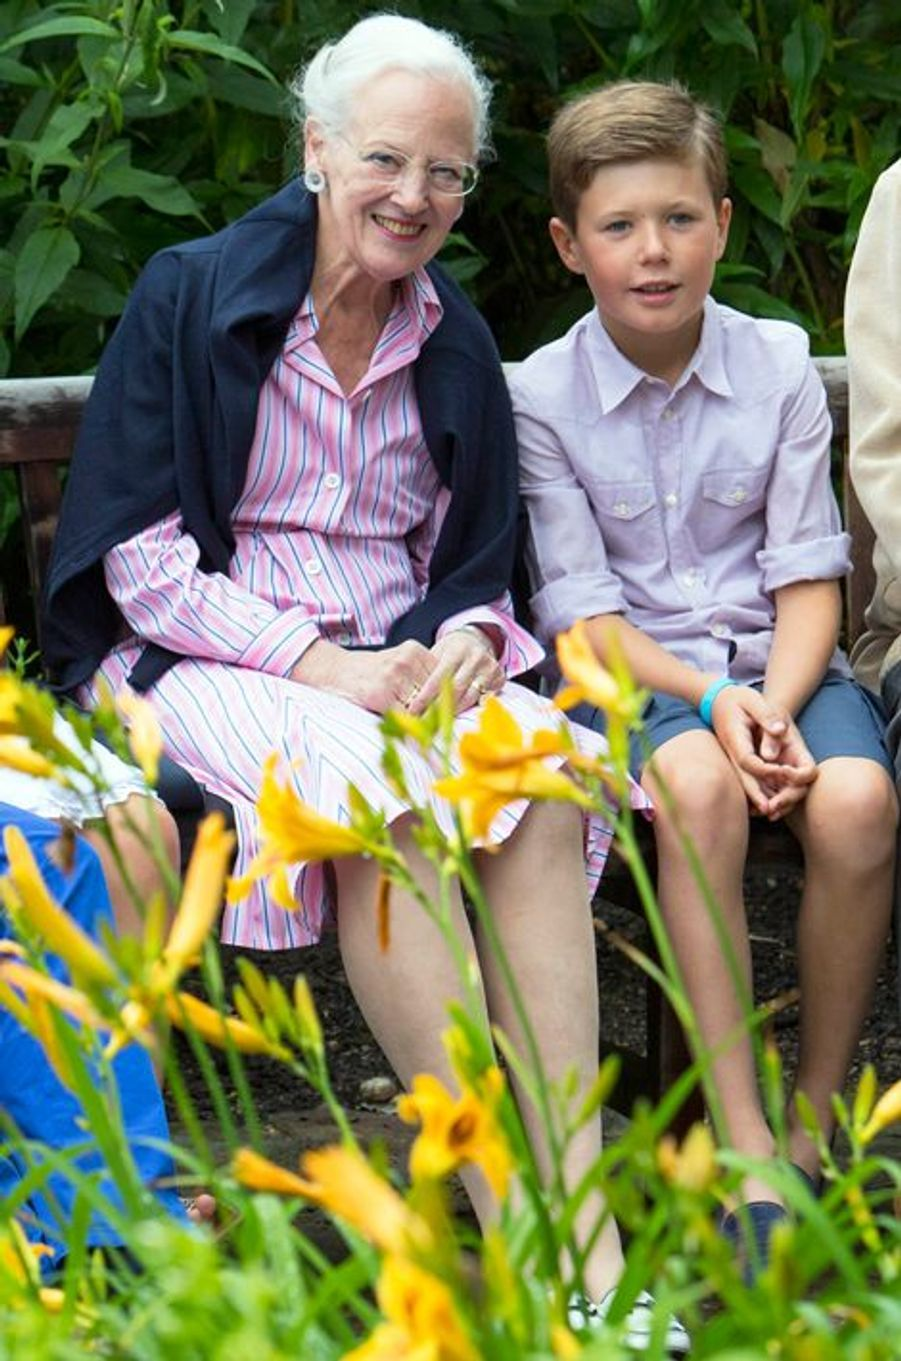 Le prince Christian de Danemark avec la reine Margrethe II le 25 juillet 2015